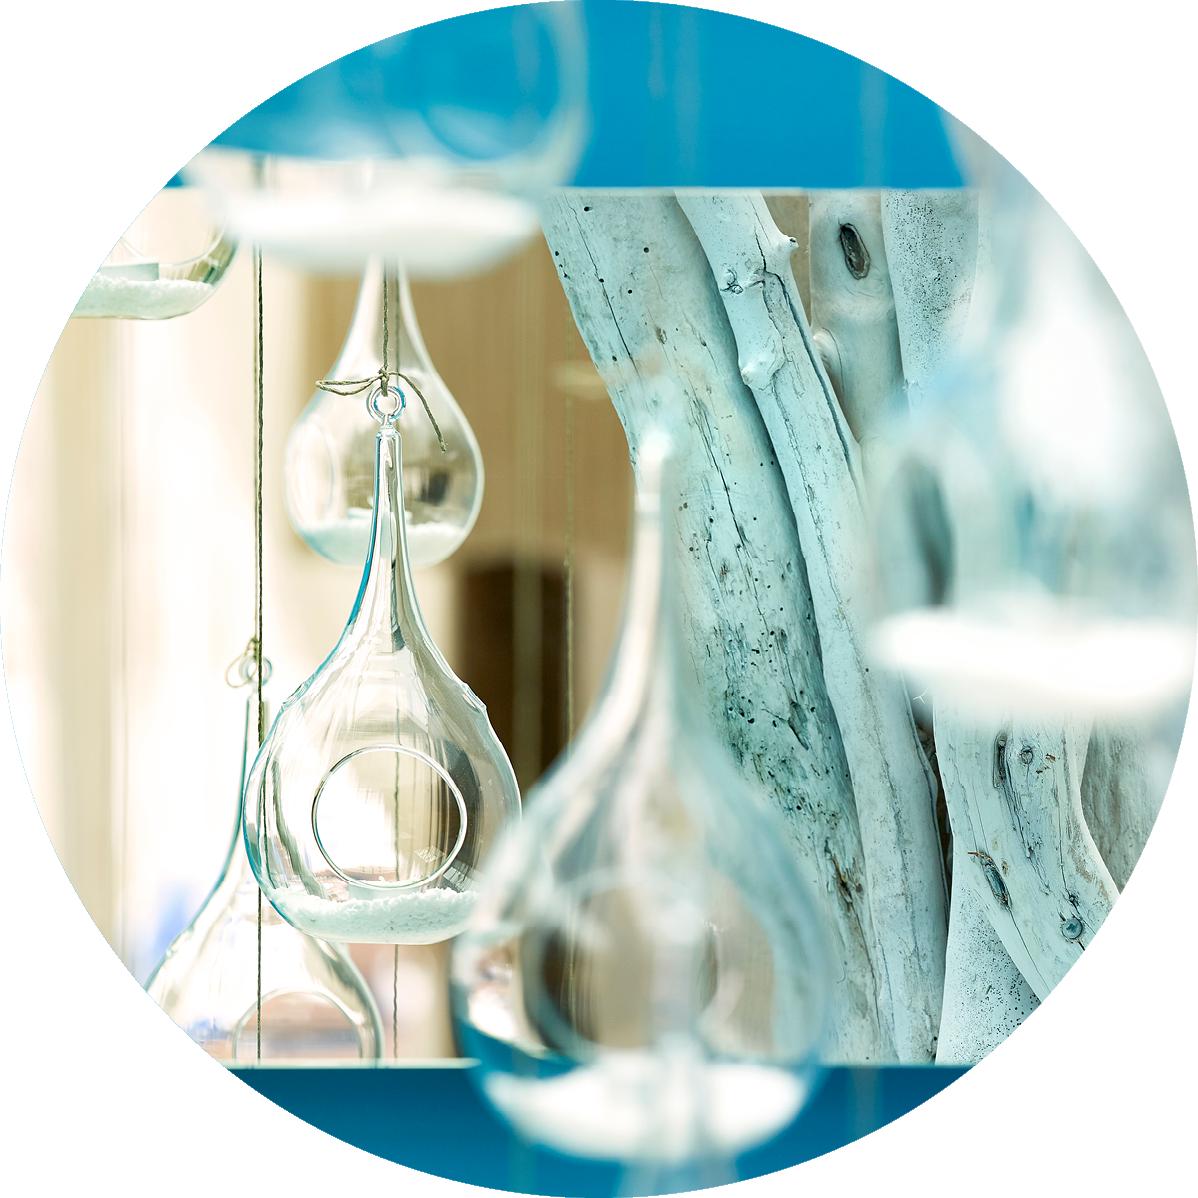 Lobby_living_room_interior_decoration_minimalism_luxury__classy_modern_design_summer_relaxing_Artemis_Deluxe_Rooms_Milos_island